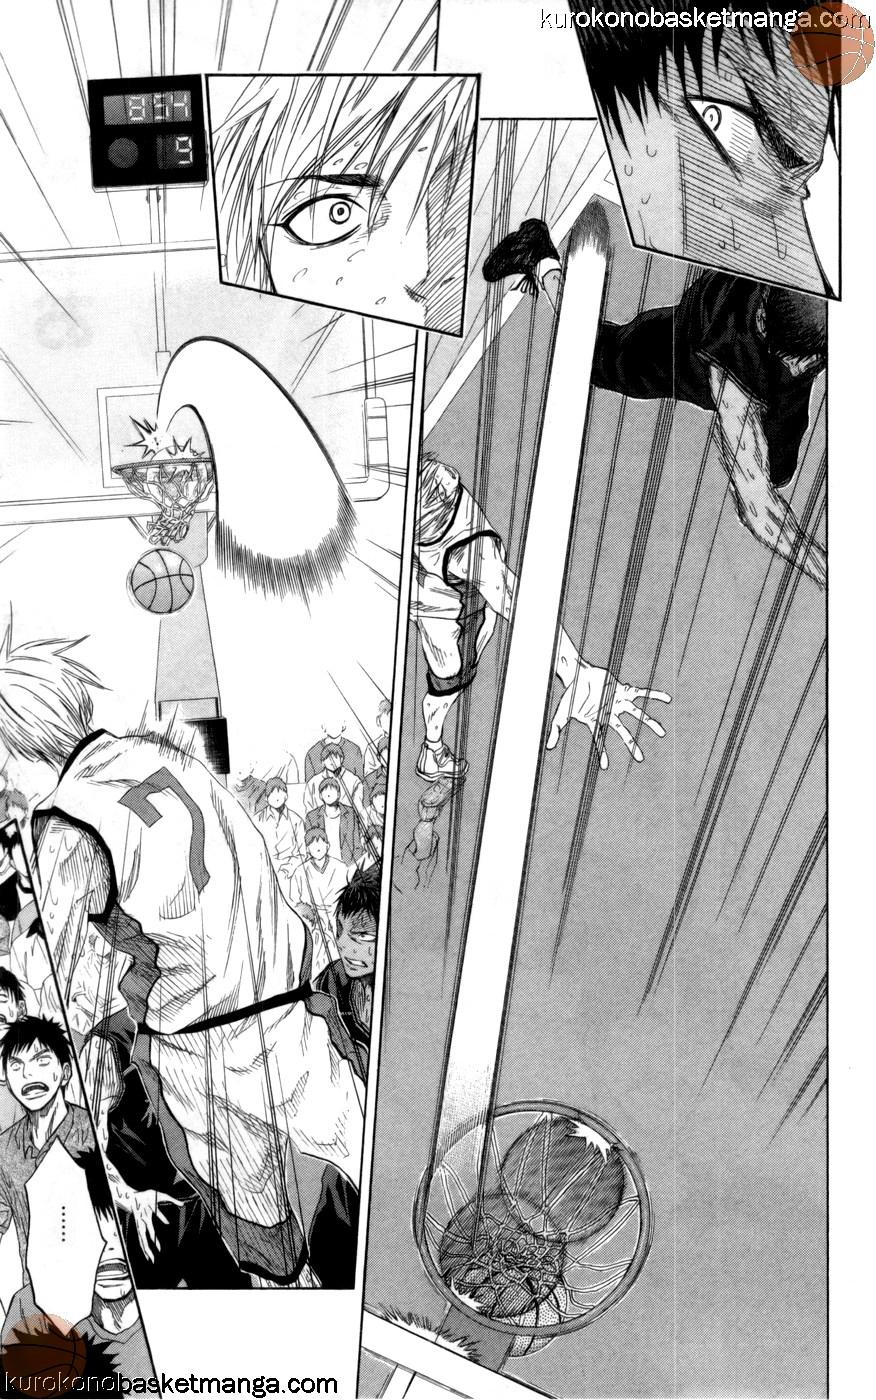 Kuroko no Basket Manga Chapter 71 - Image 13